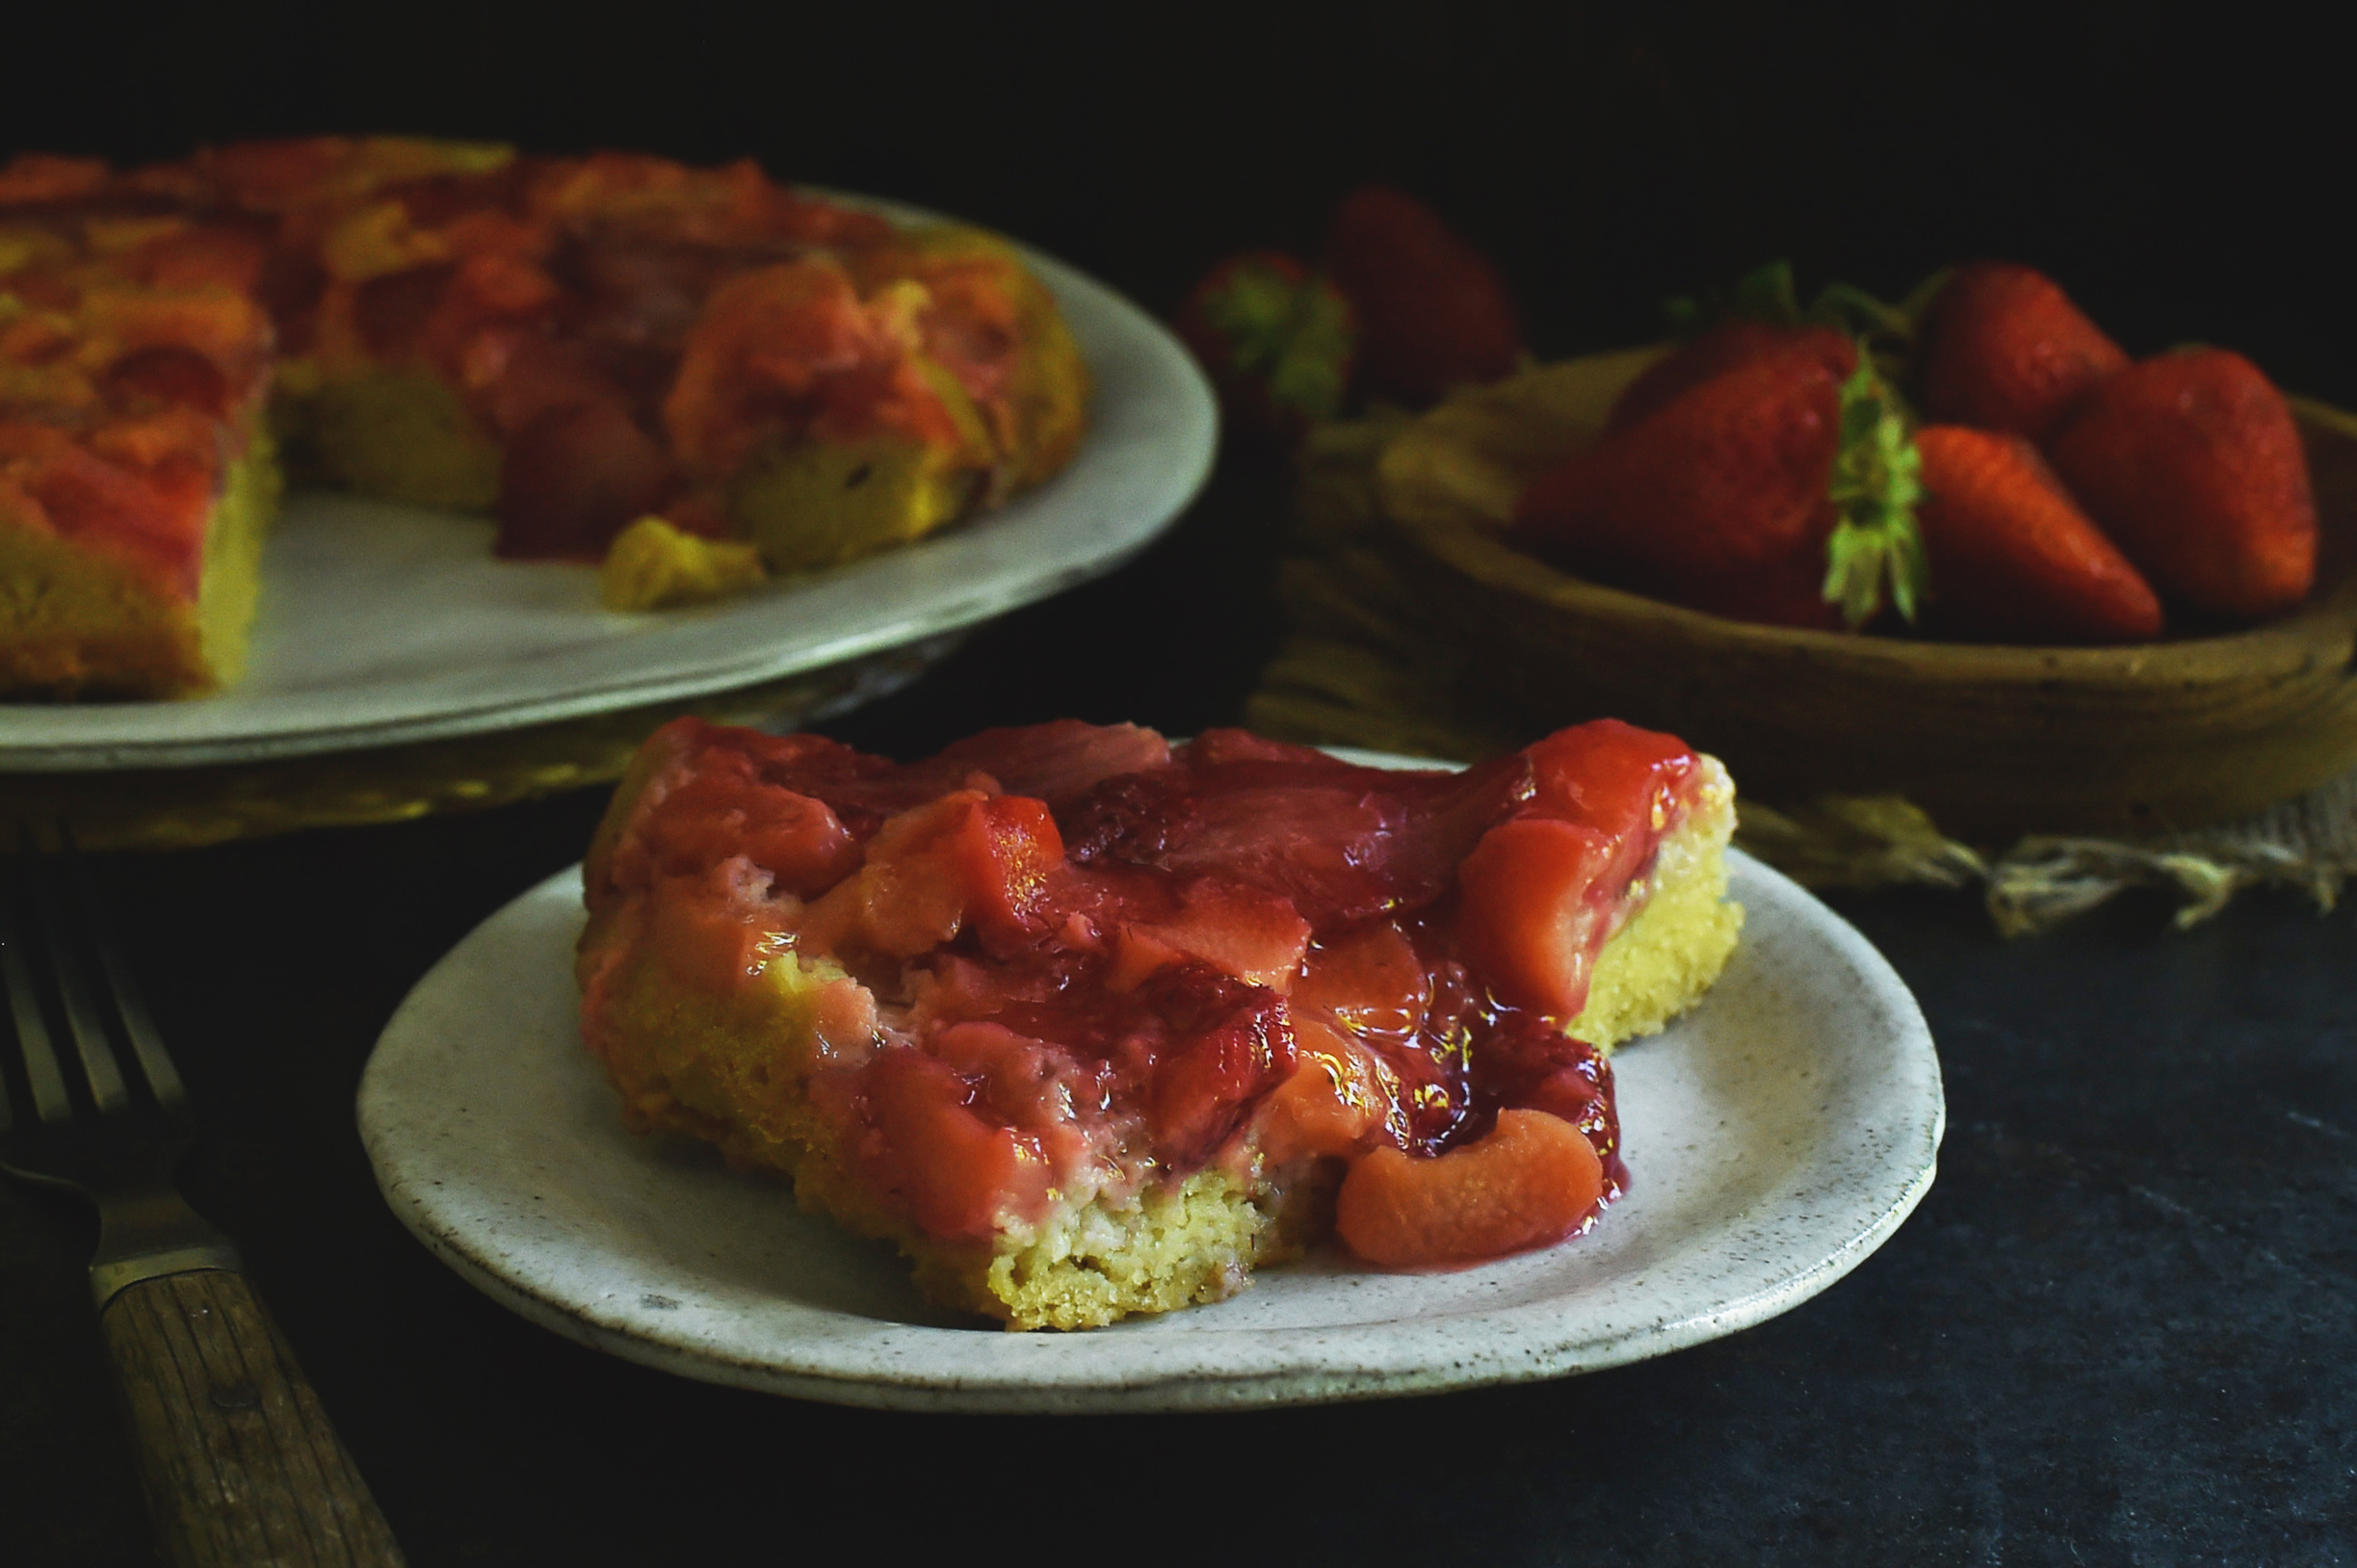 Low-Carb Strawberry Rhubarb Upside-Down Cake Recipe